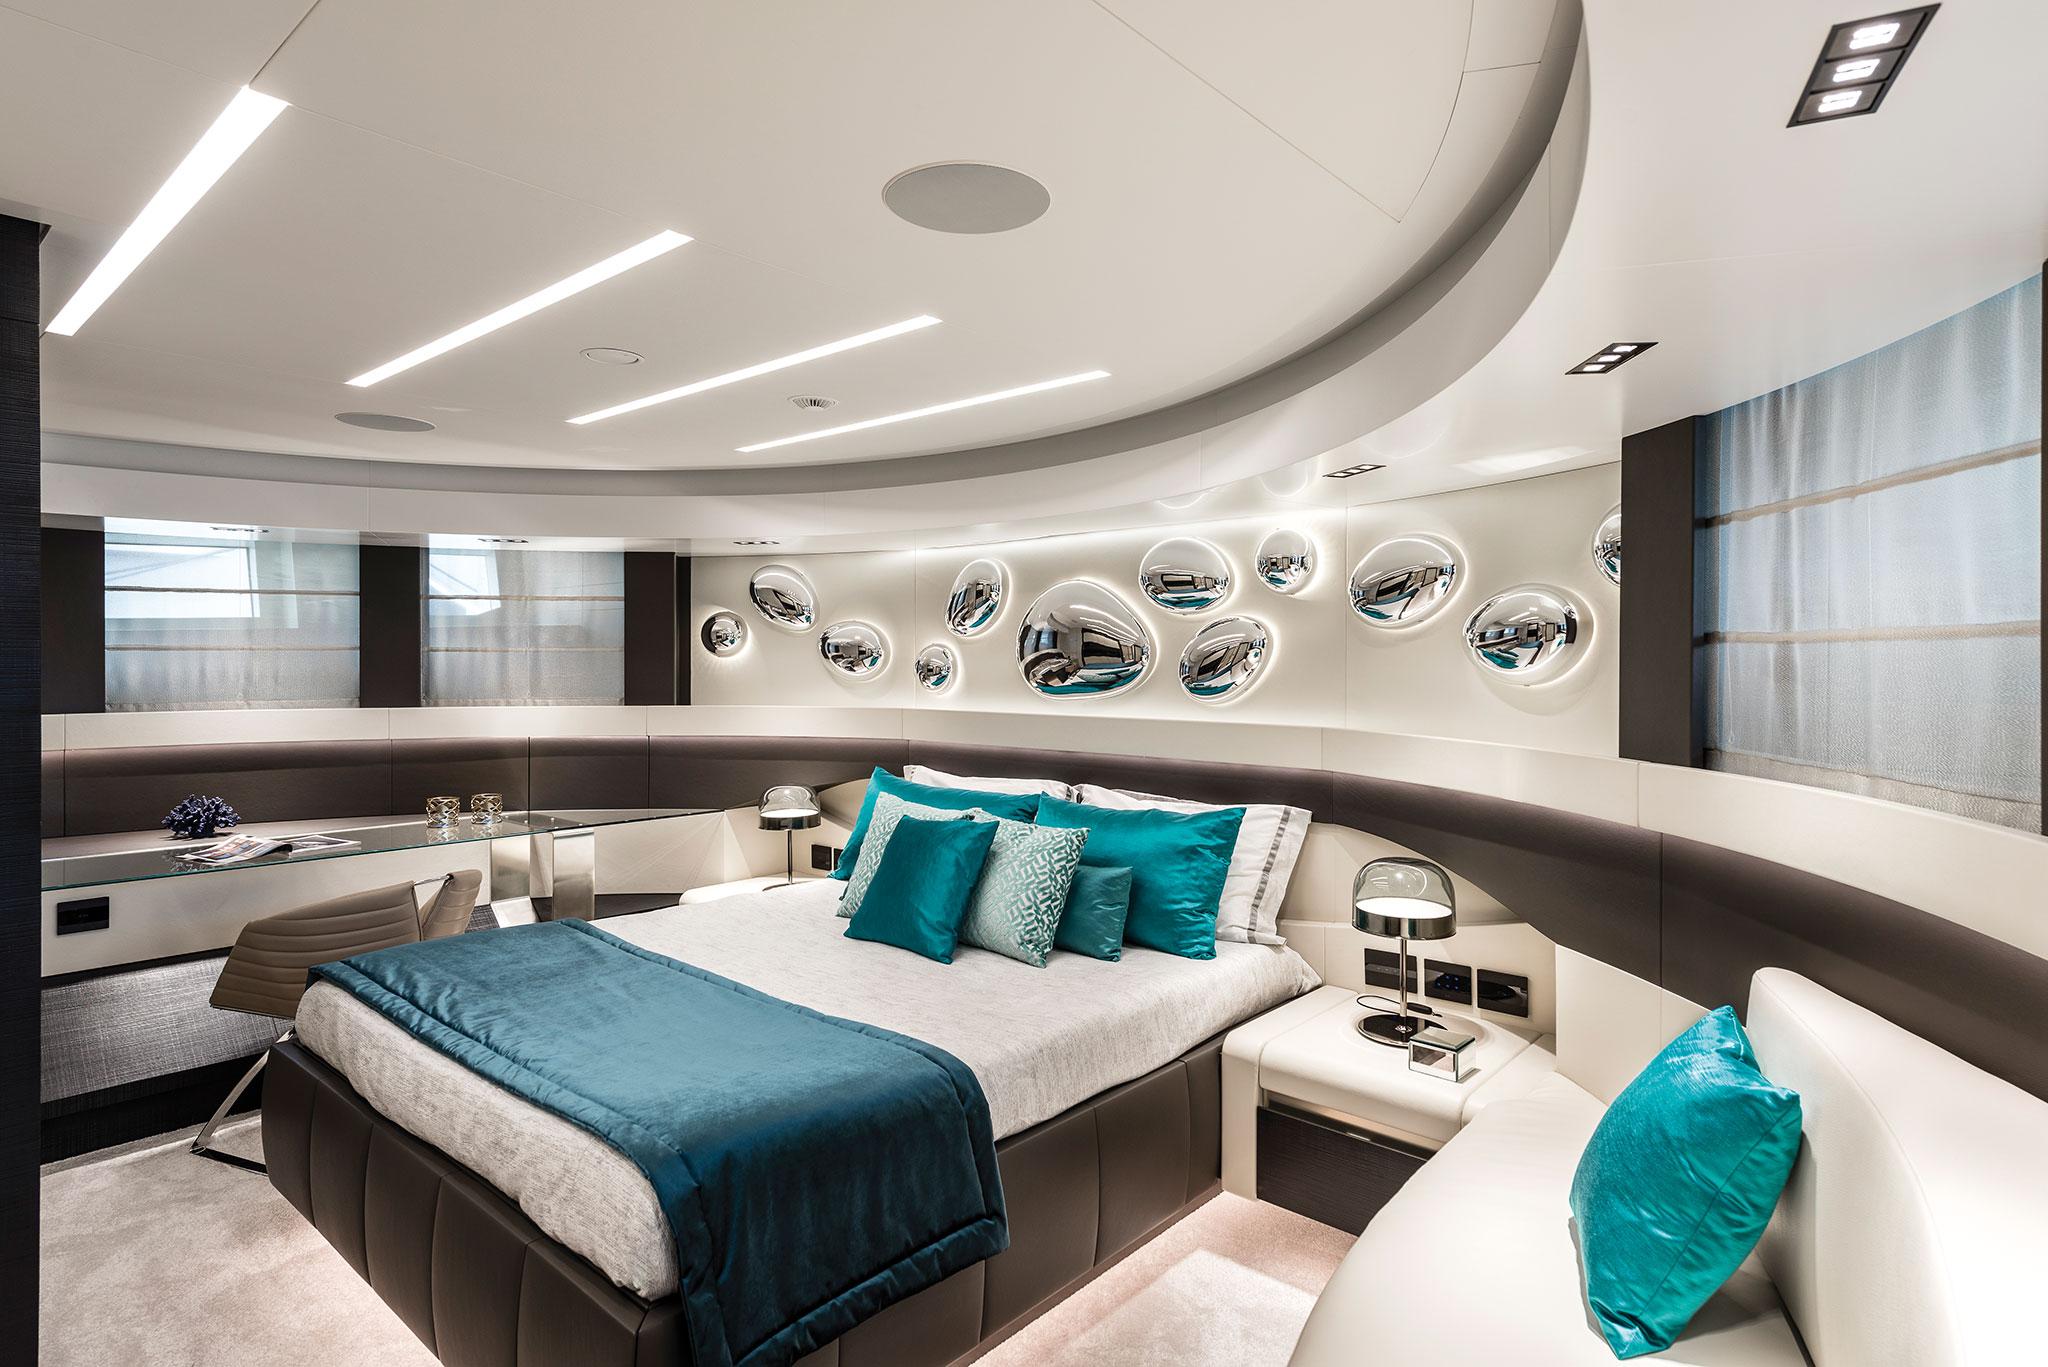 Pershing-140_chorusline_master_cabin-yachts-france-172